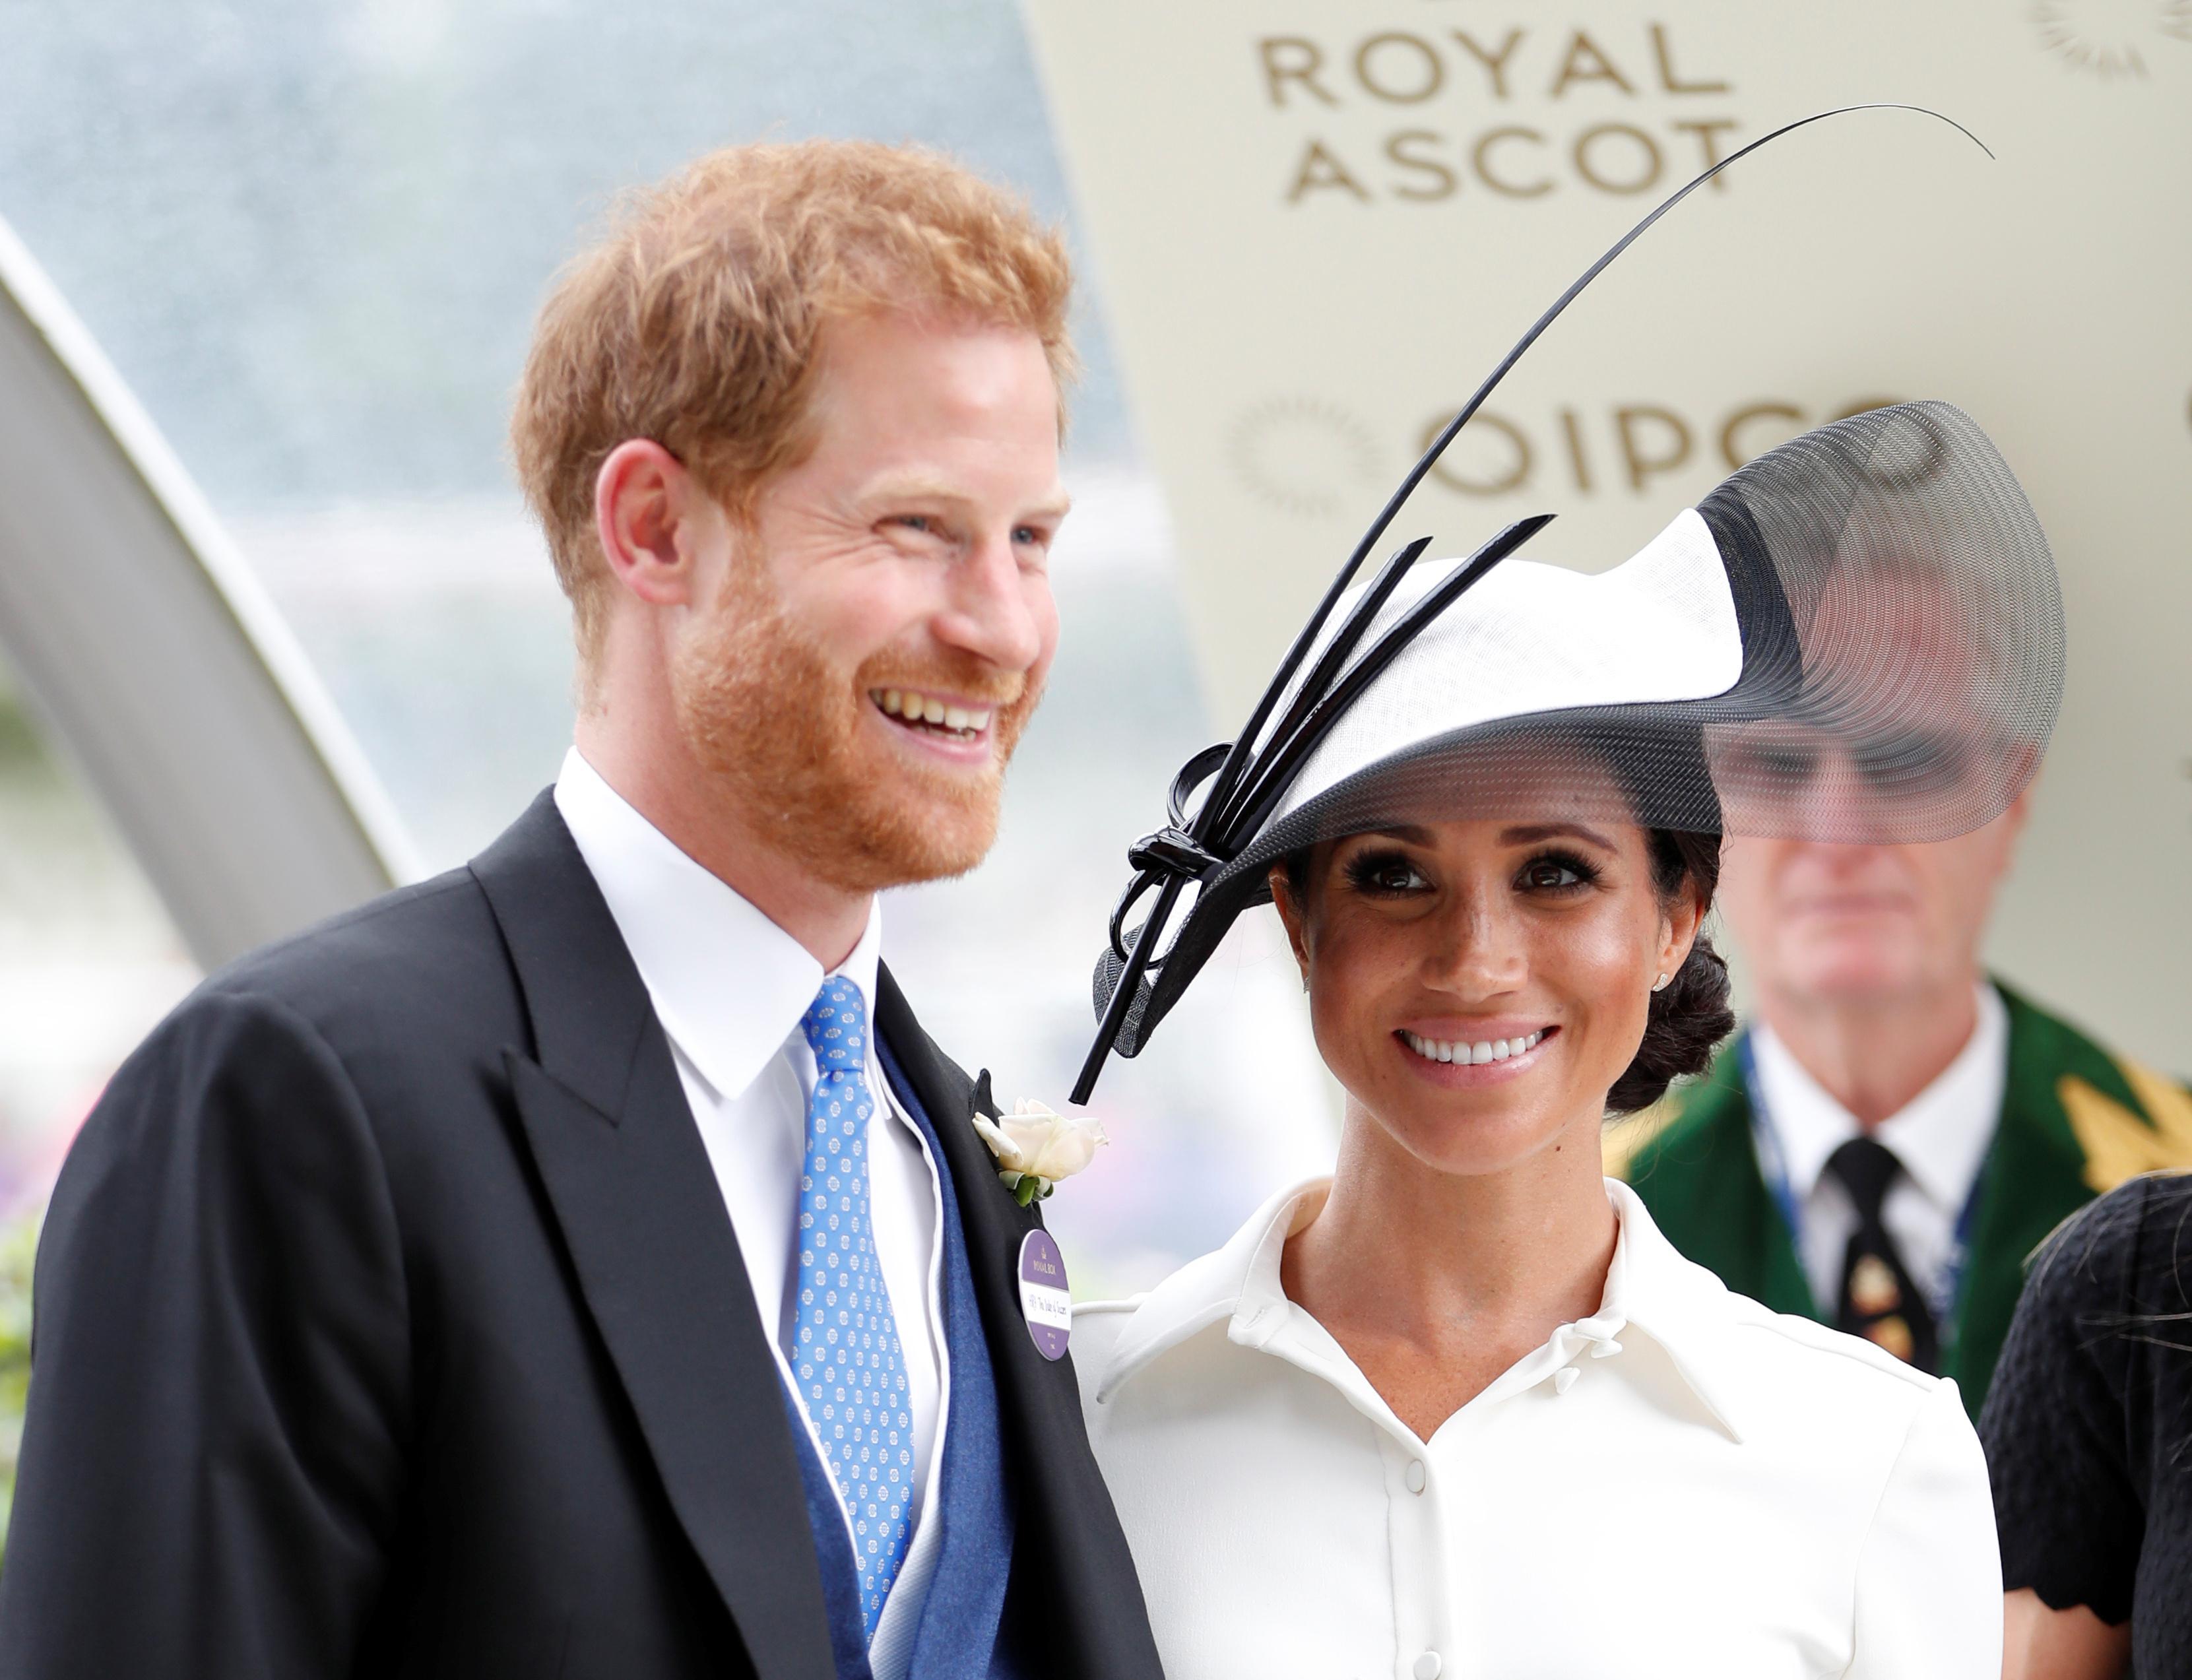 Os looks de Meghan Markle inspirados na princesa Diana